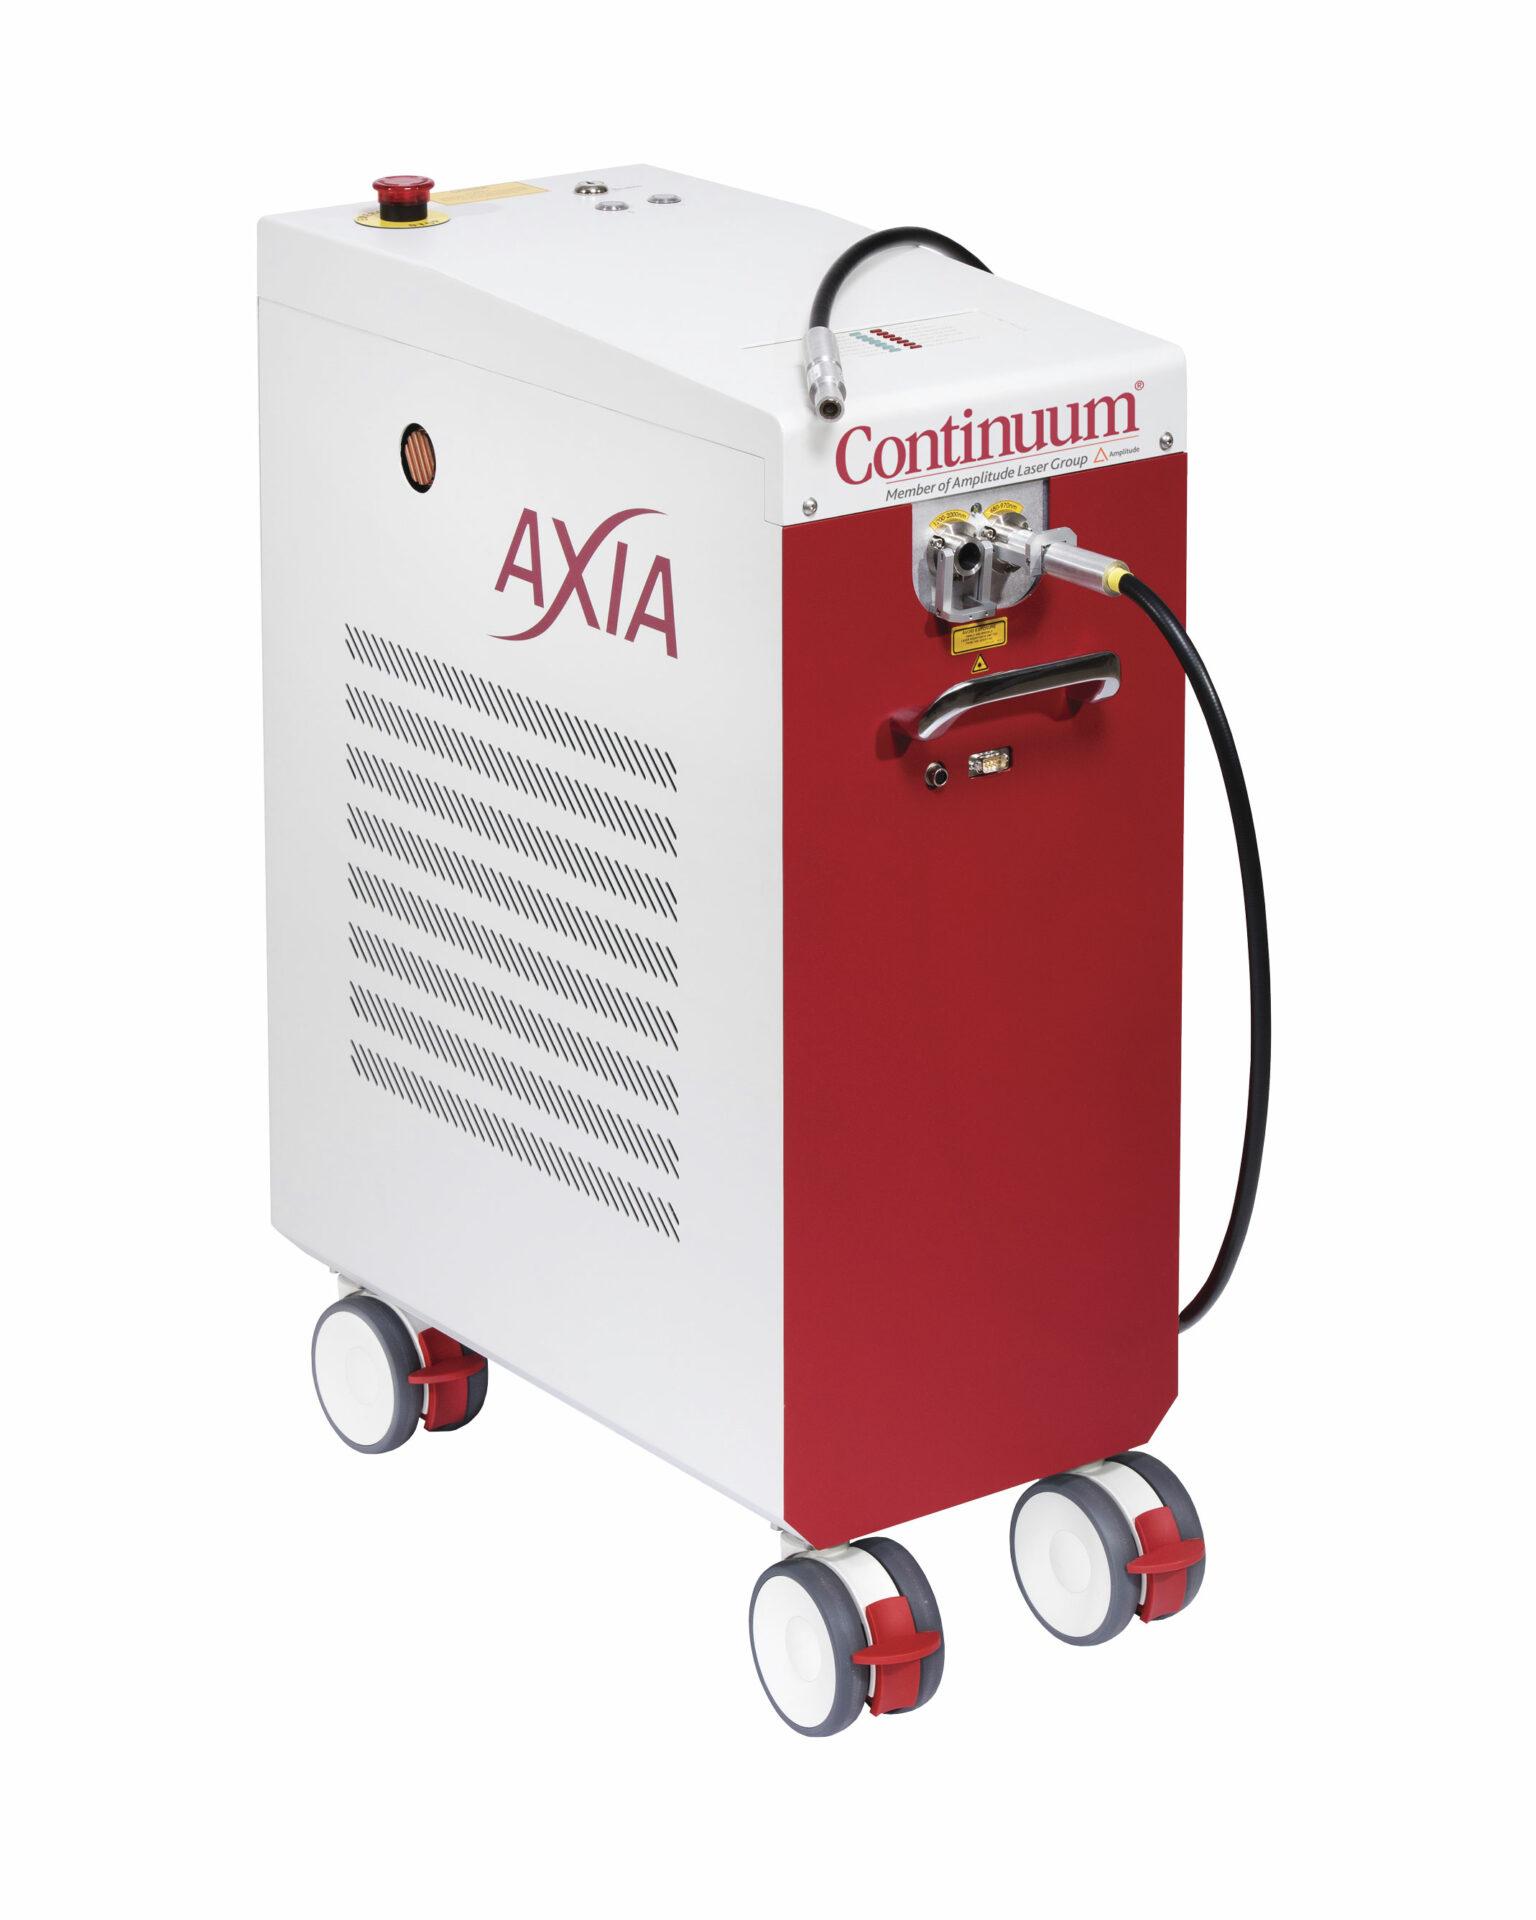 Axia Flashlamps pump